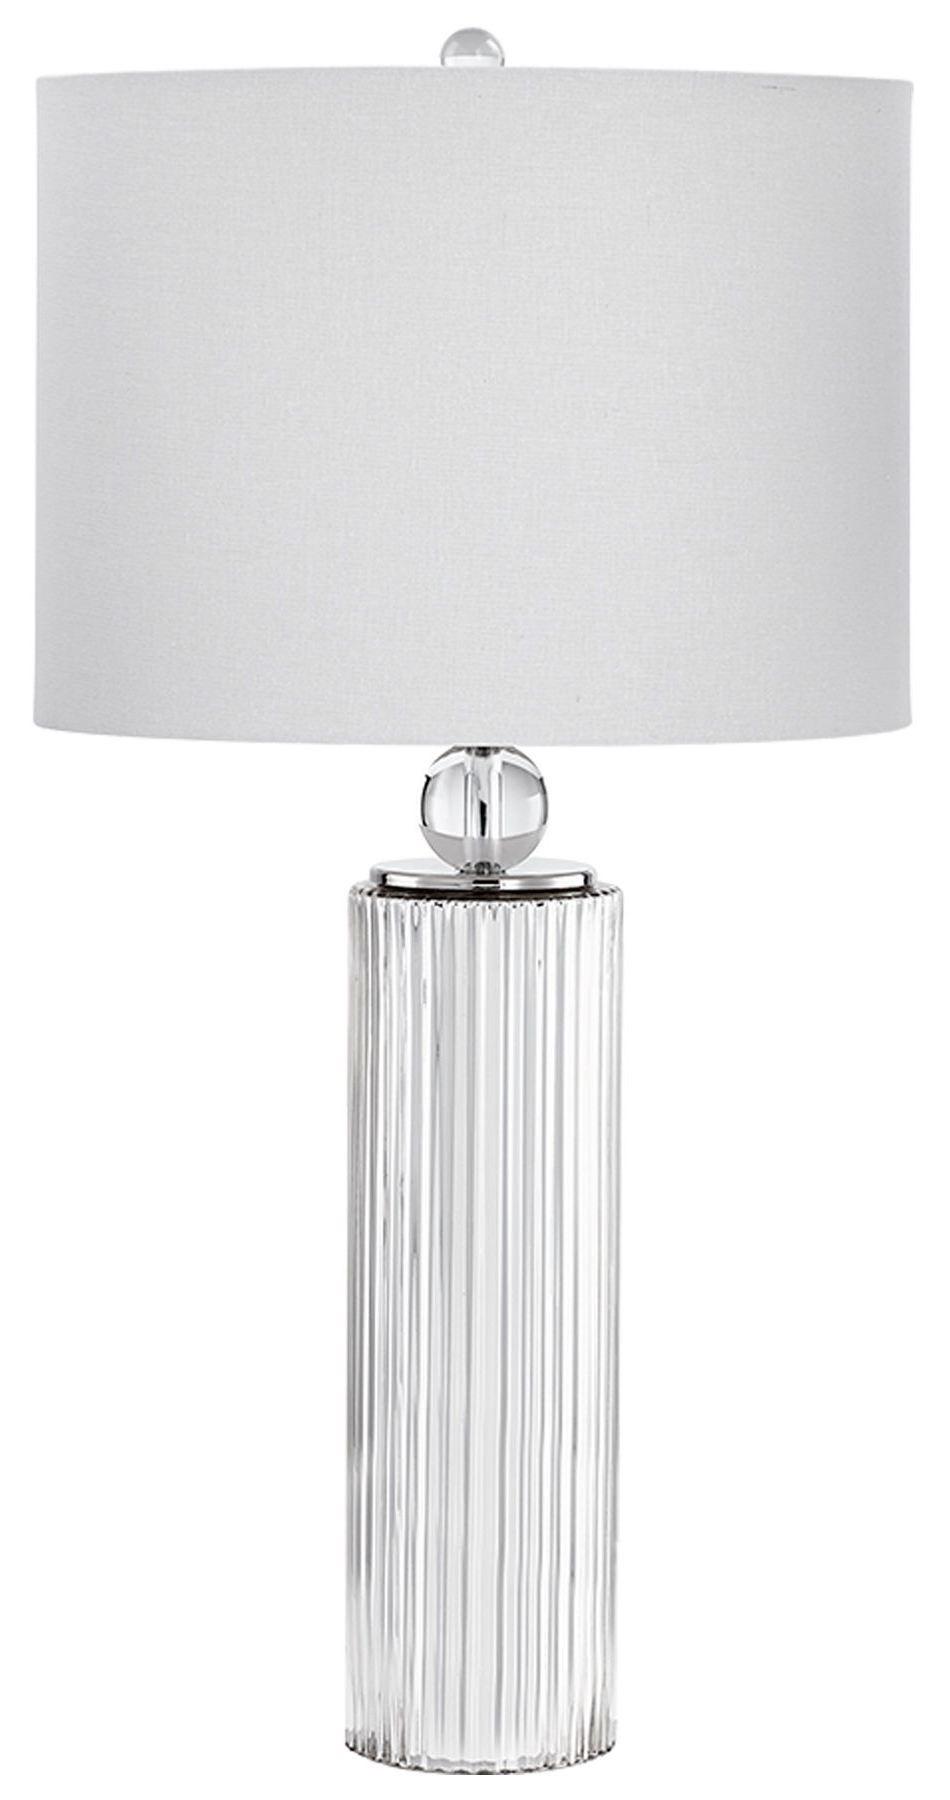 Nickel Lighting CFL Table Lamp 08521 1 Cyan Design